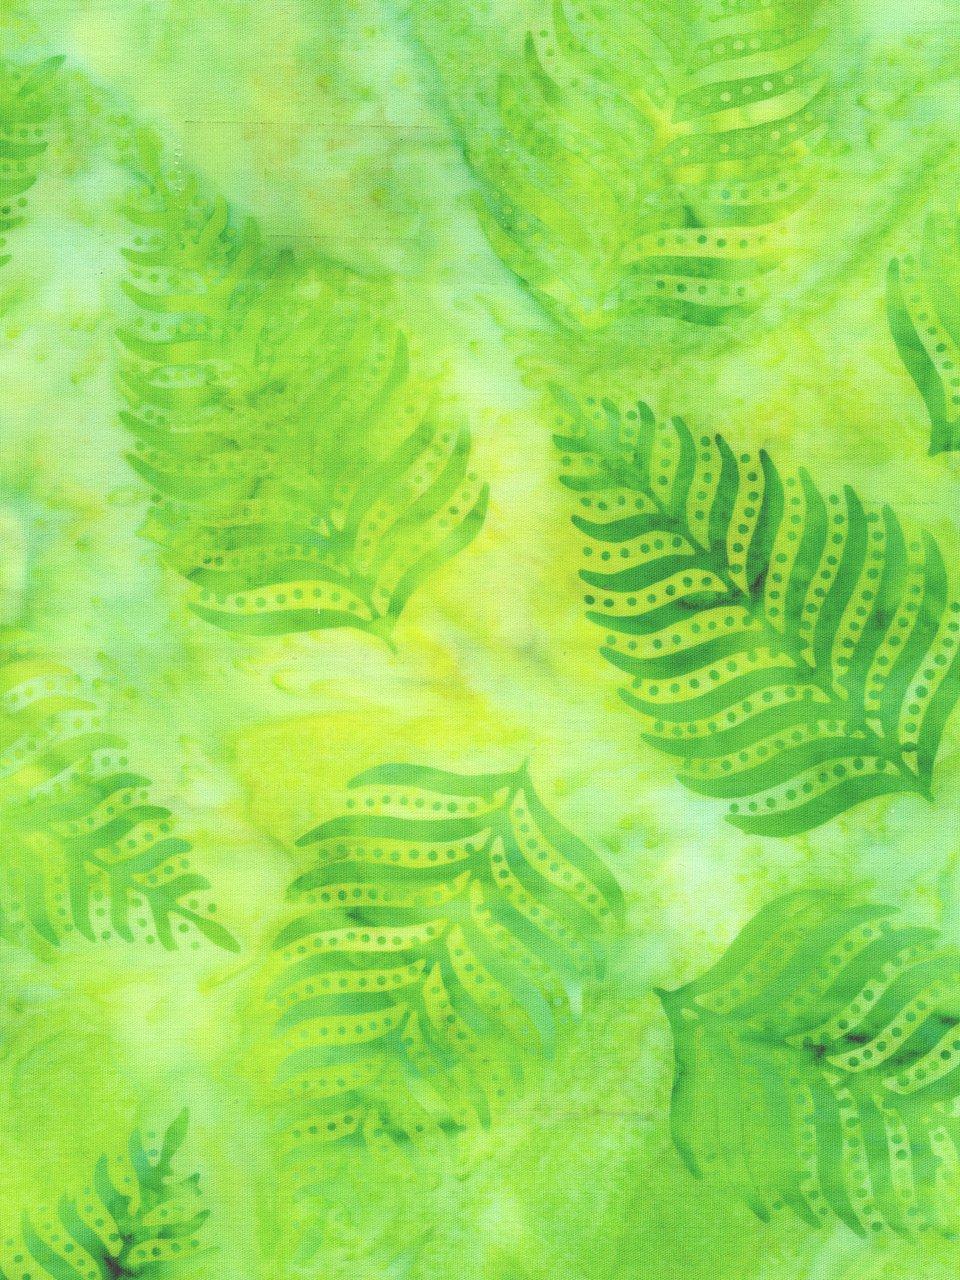 Anthology BC-14027 Bright green fern